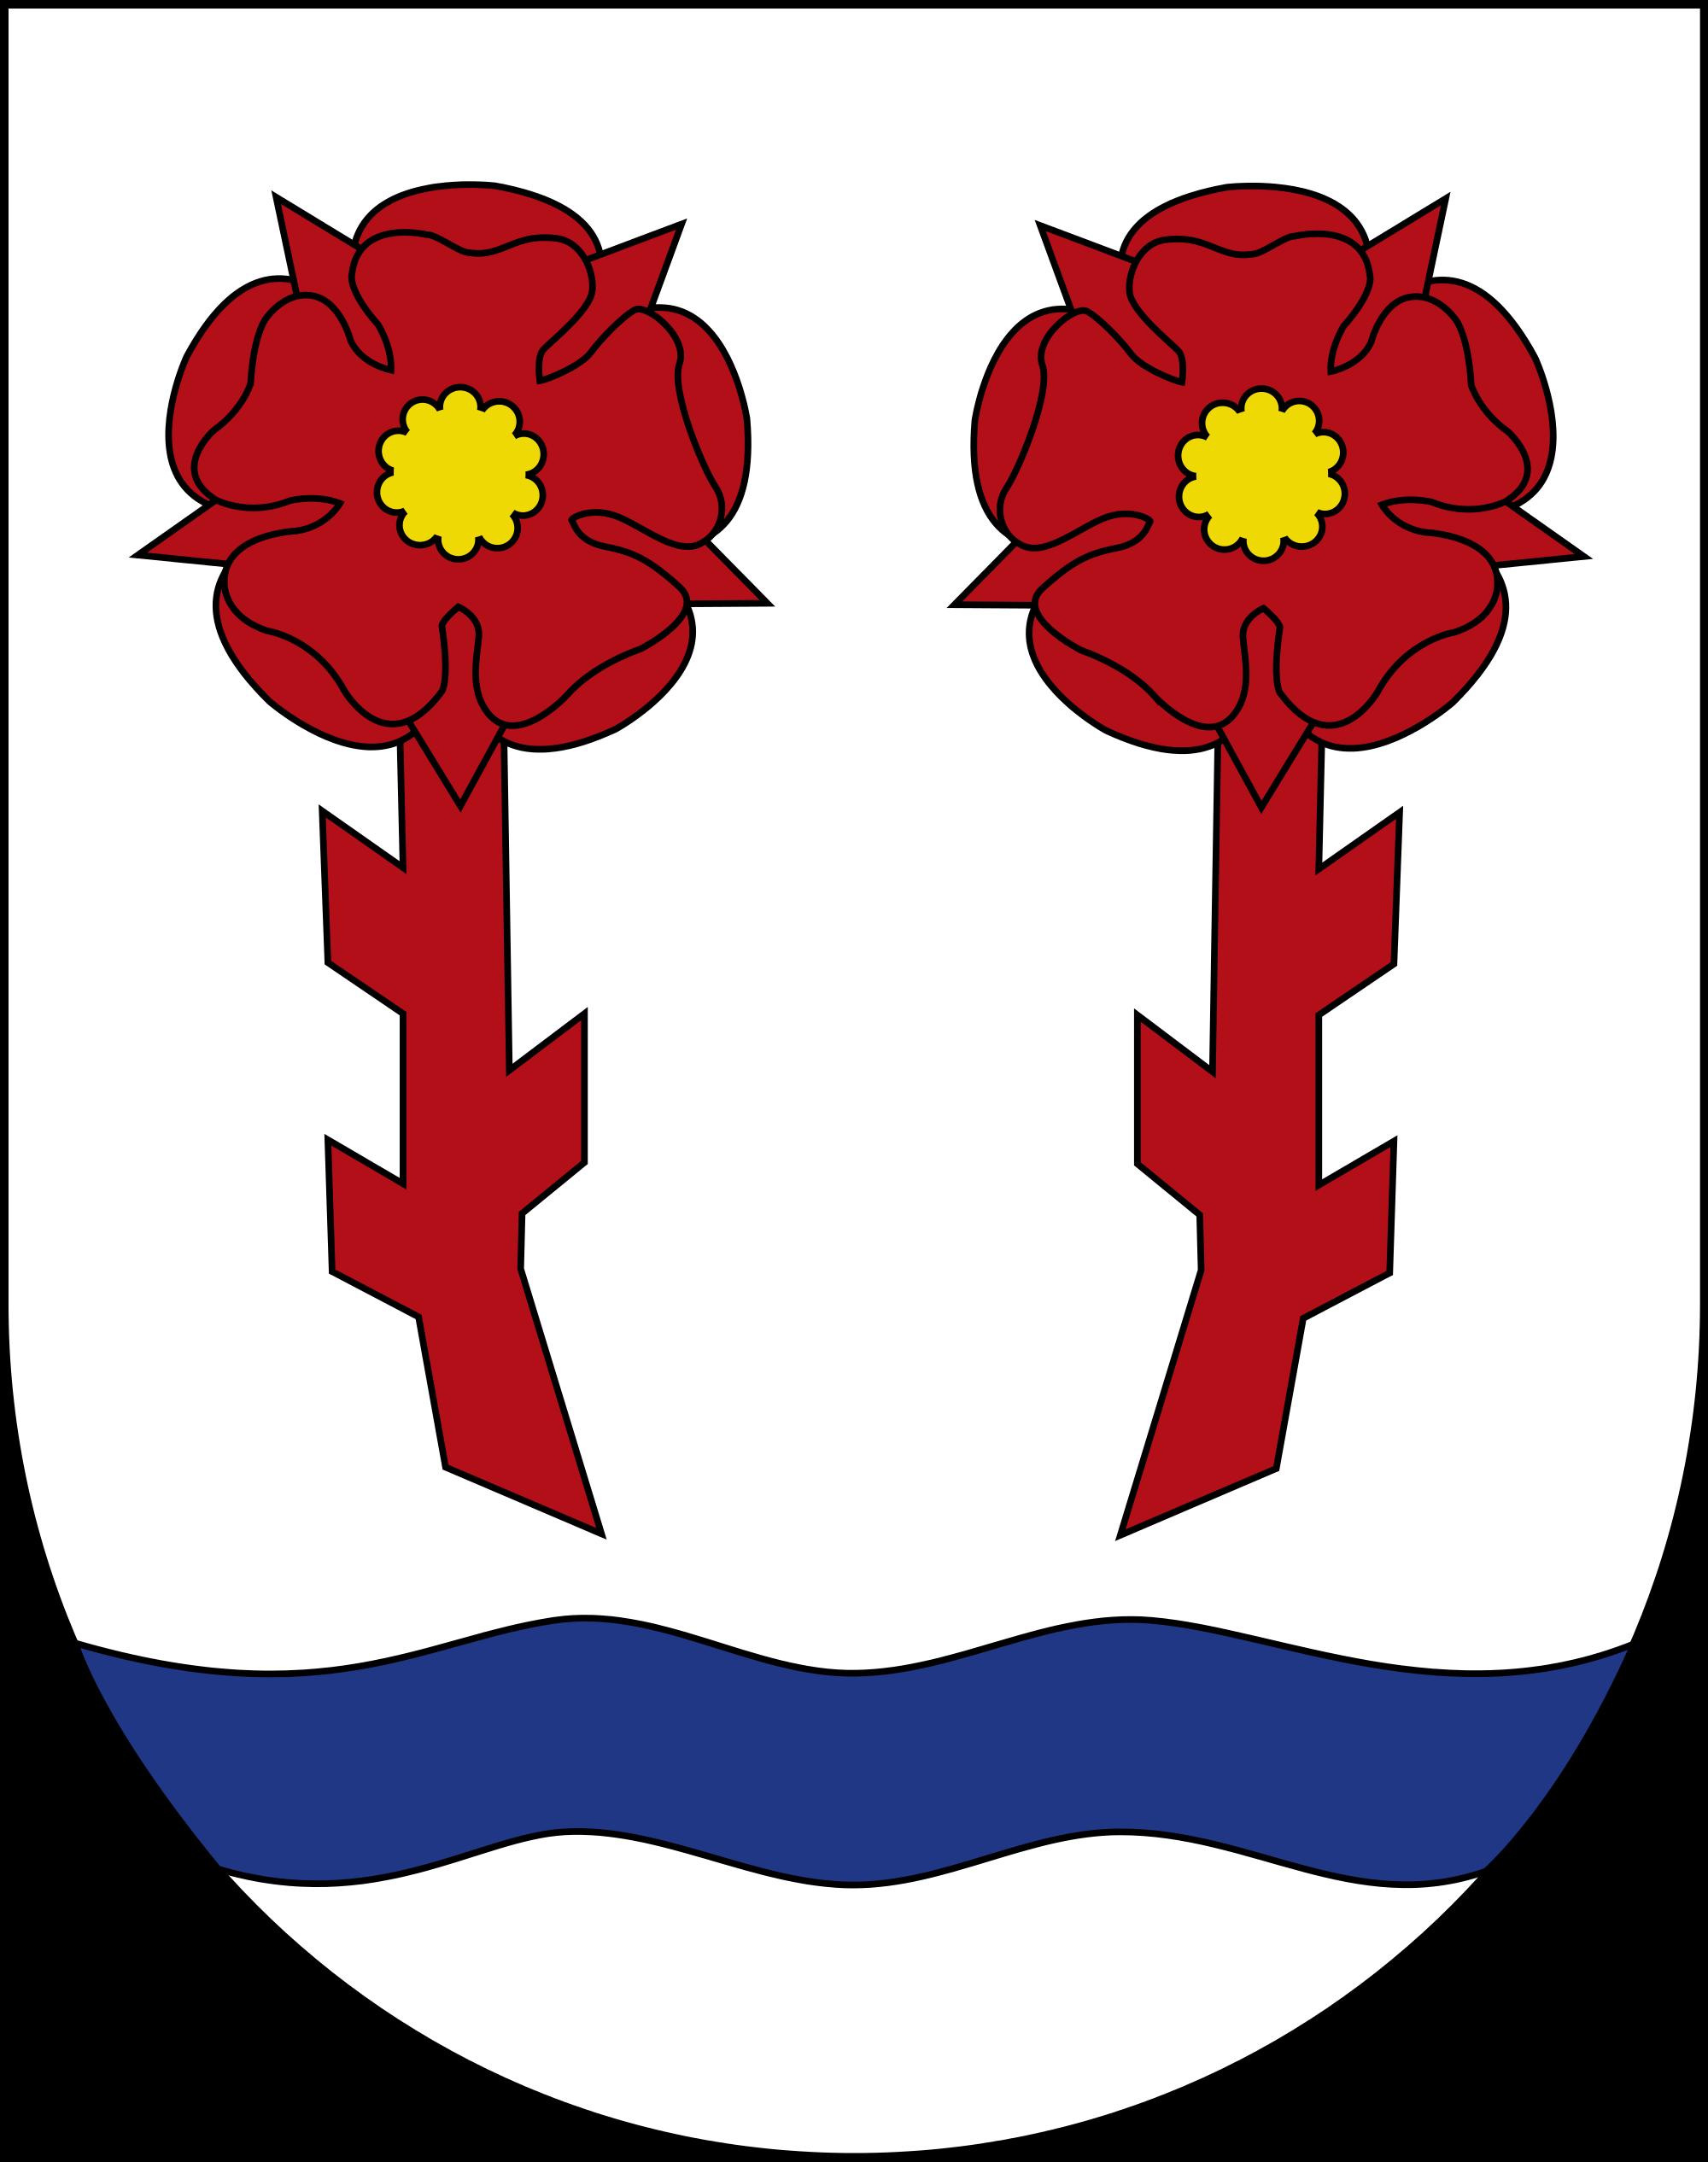 File:Rapperswil.